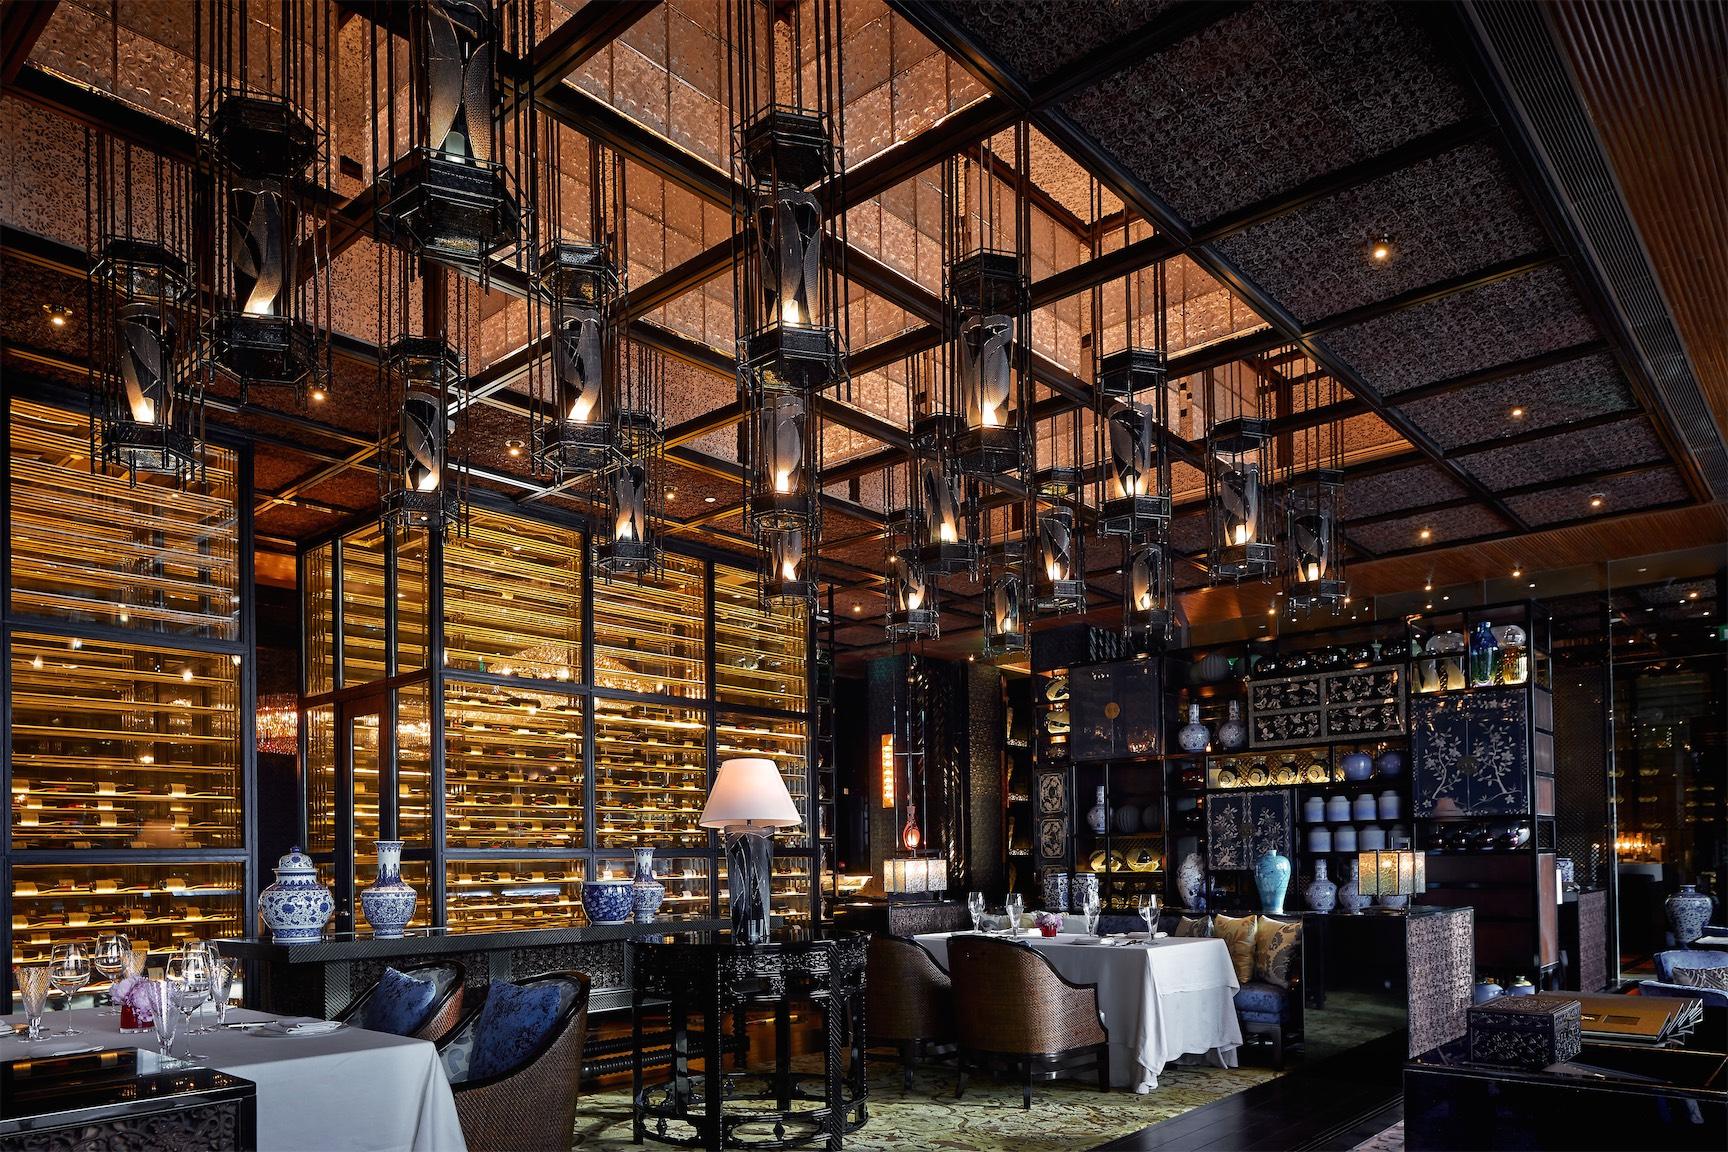 The New Ritz Carlton Amp Jw Marriott Hotel In Macau Foodie